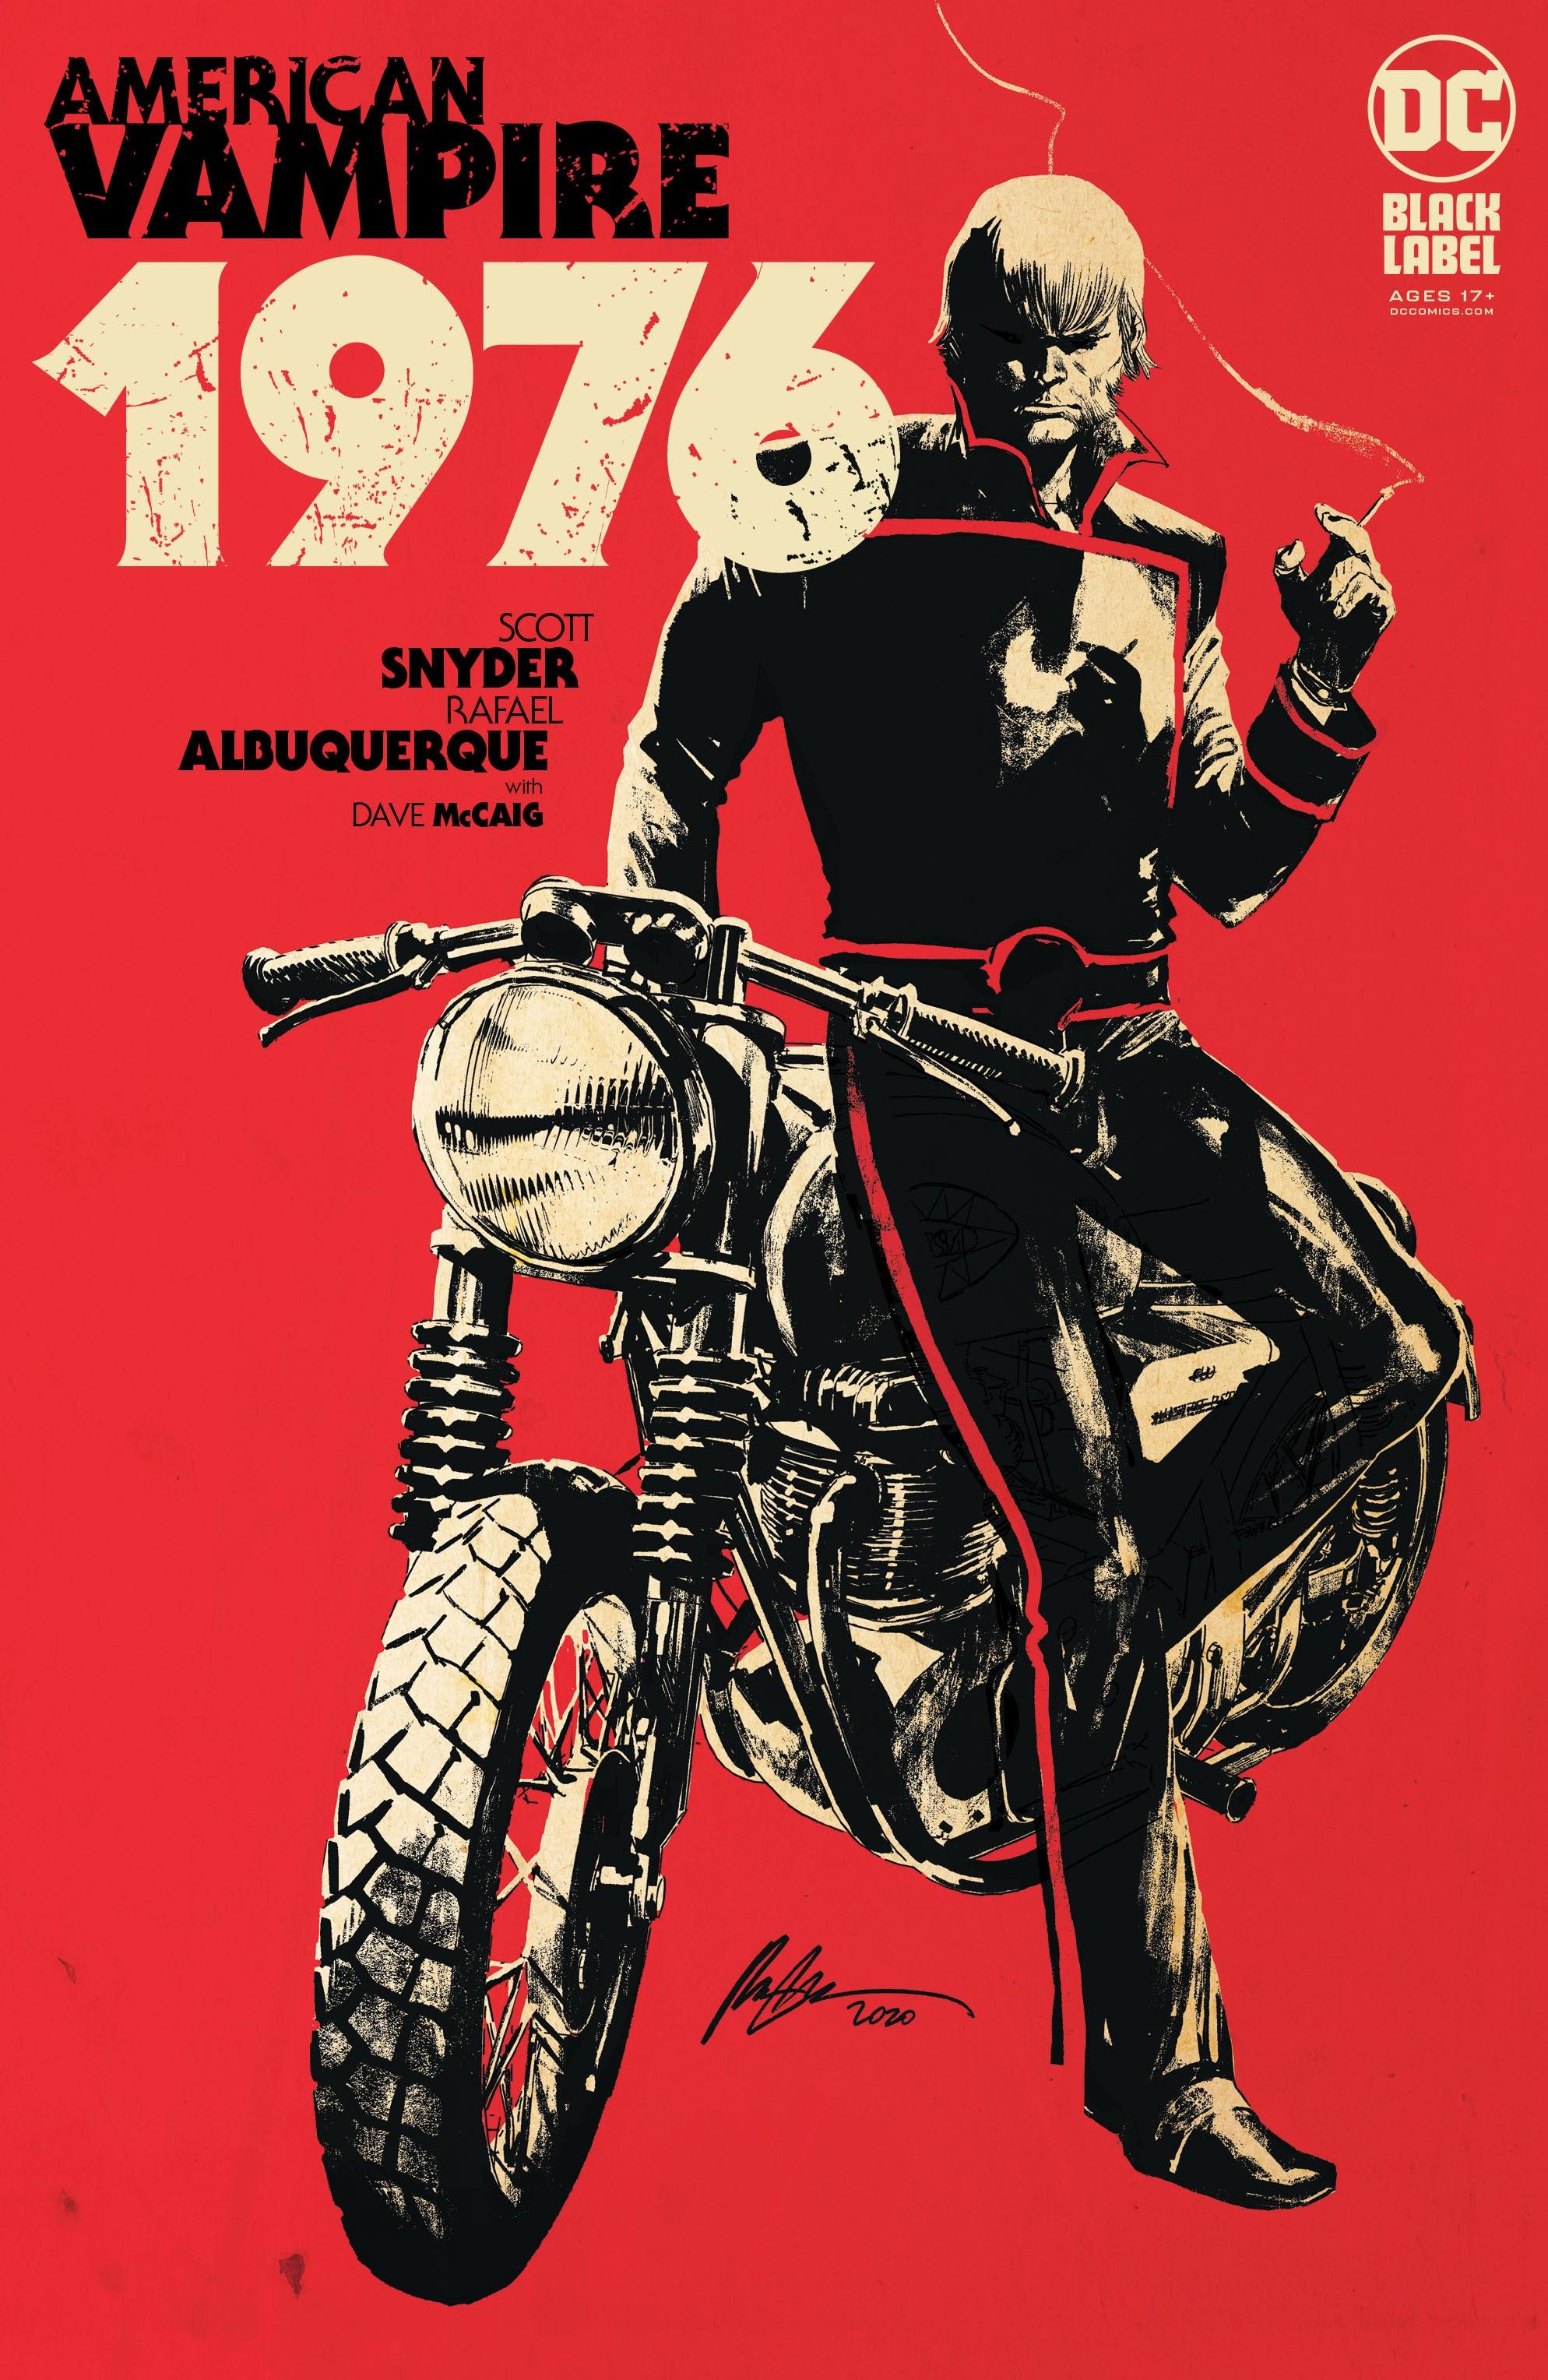 American Vampire 1976 Vol 1